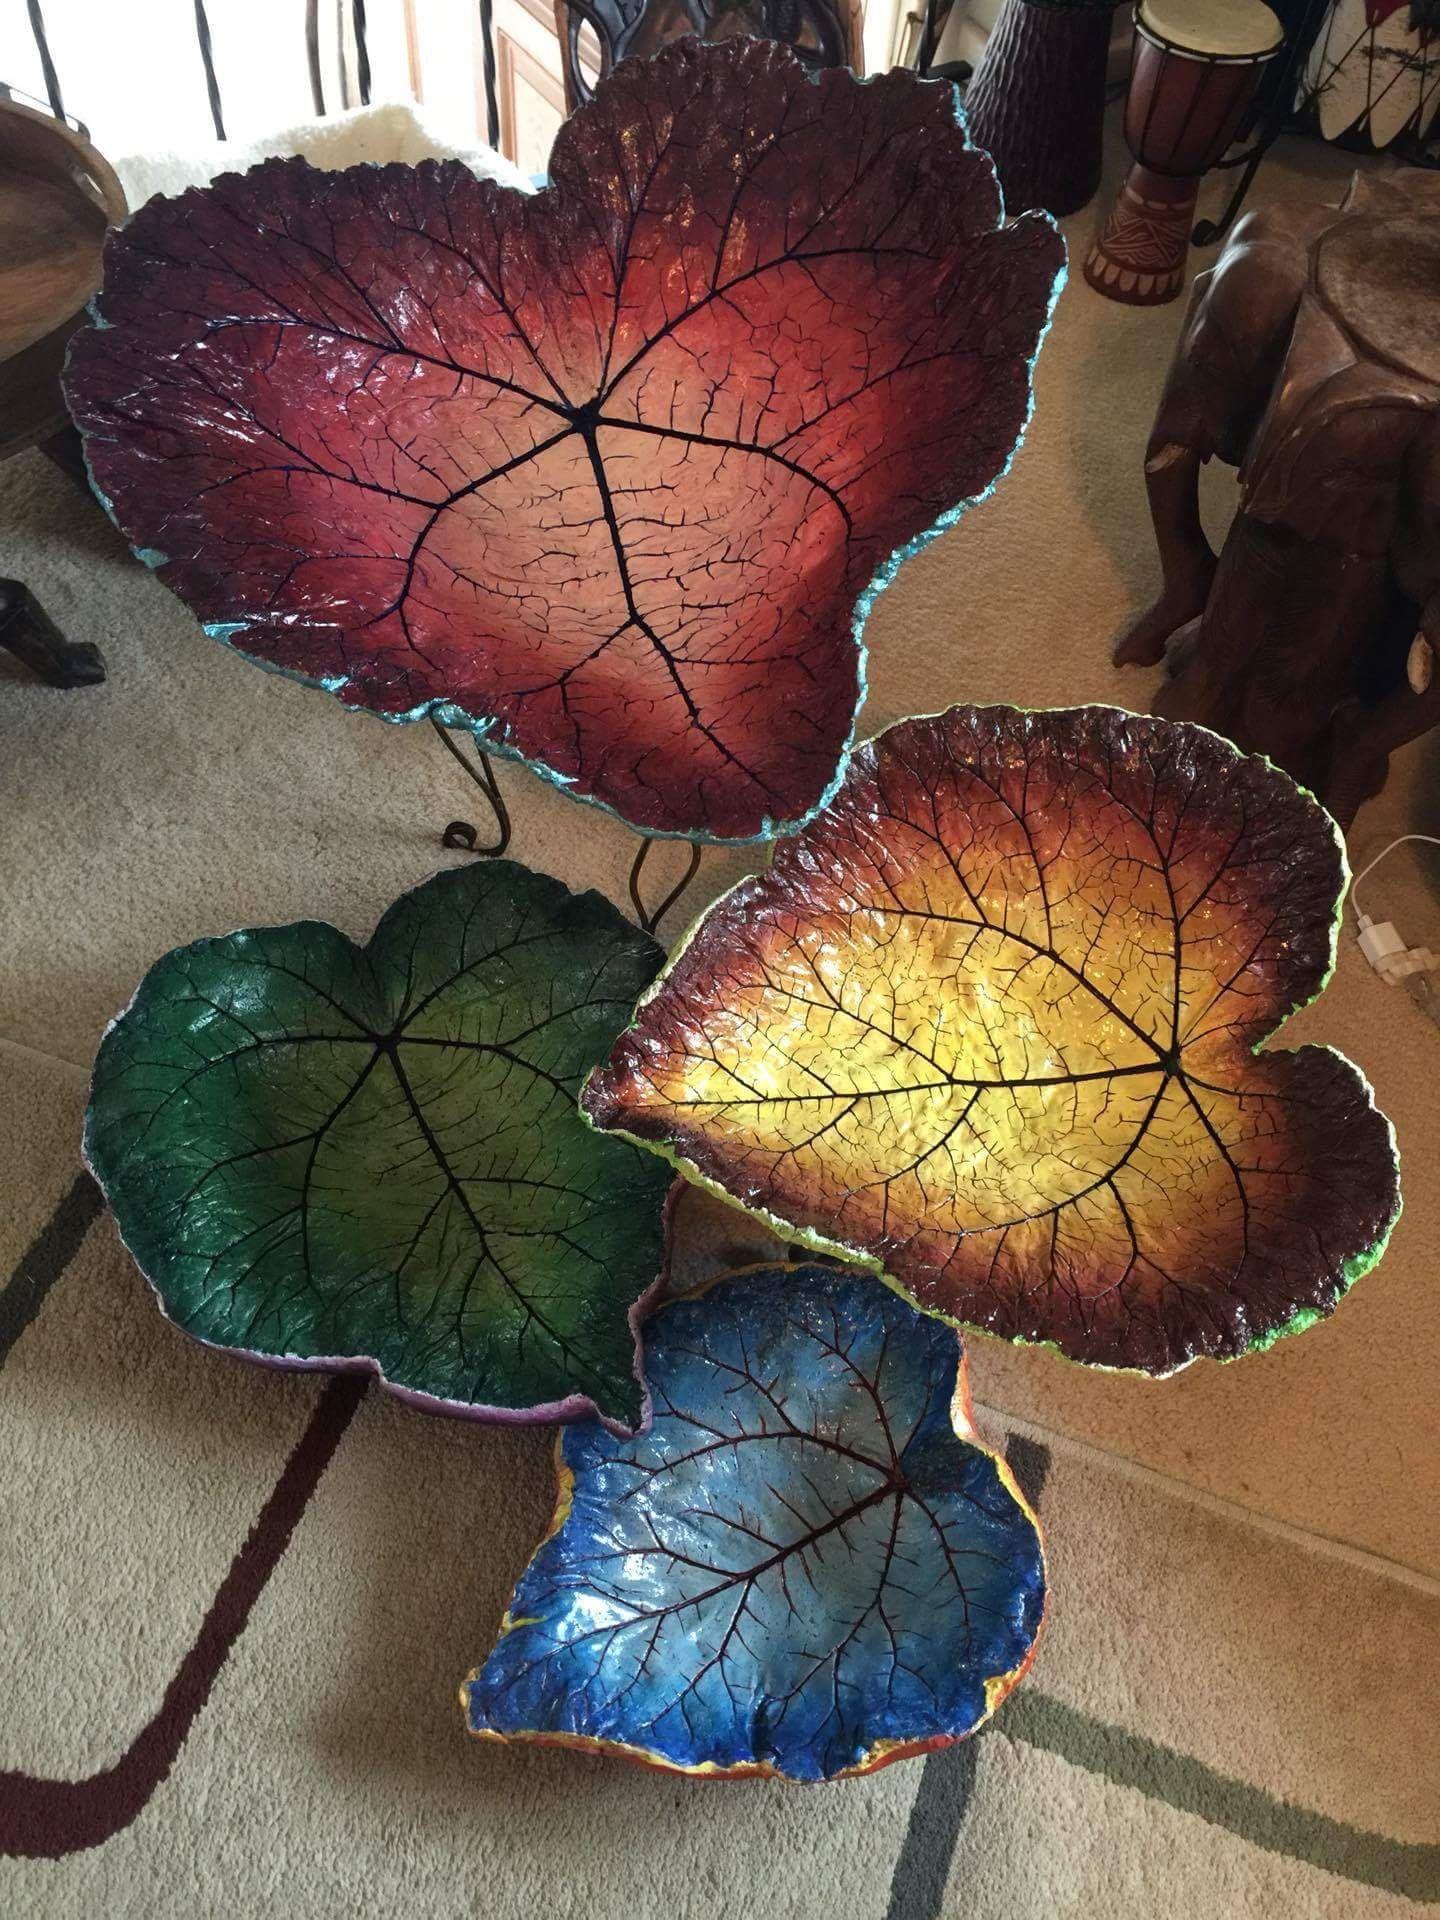 cement rheubarb leaf hand painted by barbara h